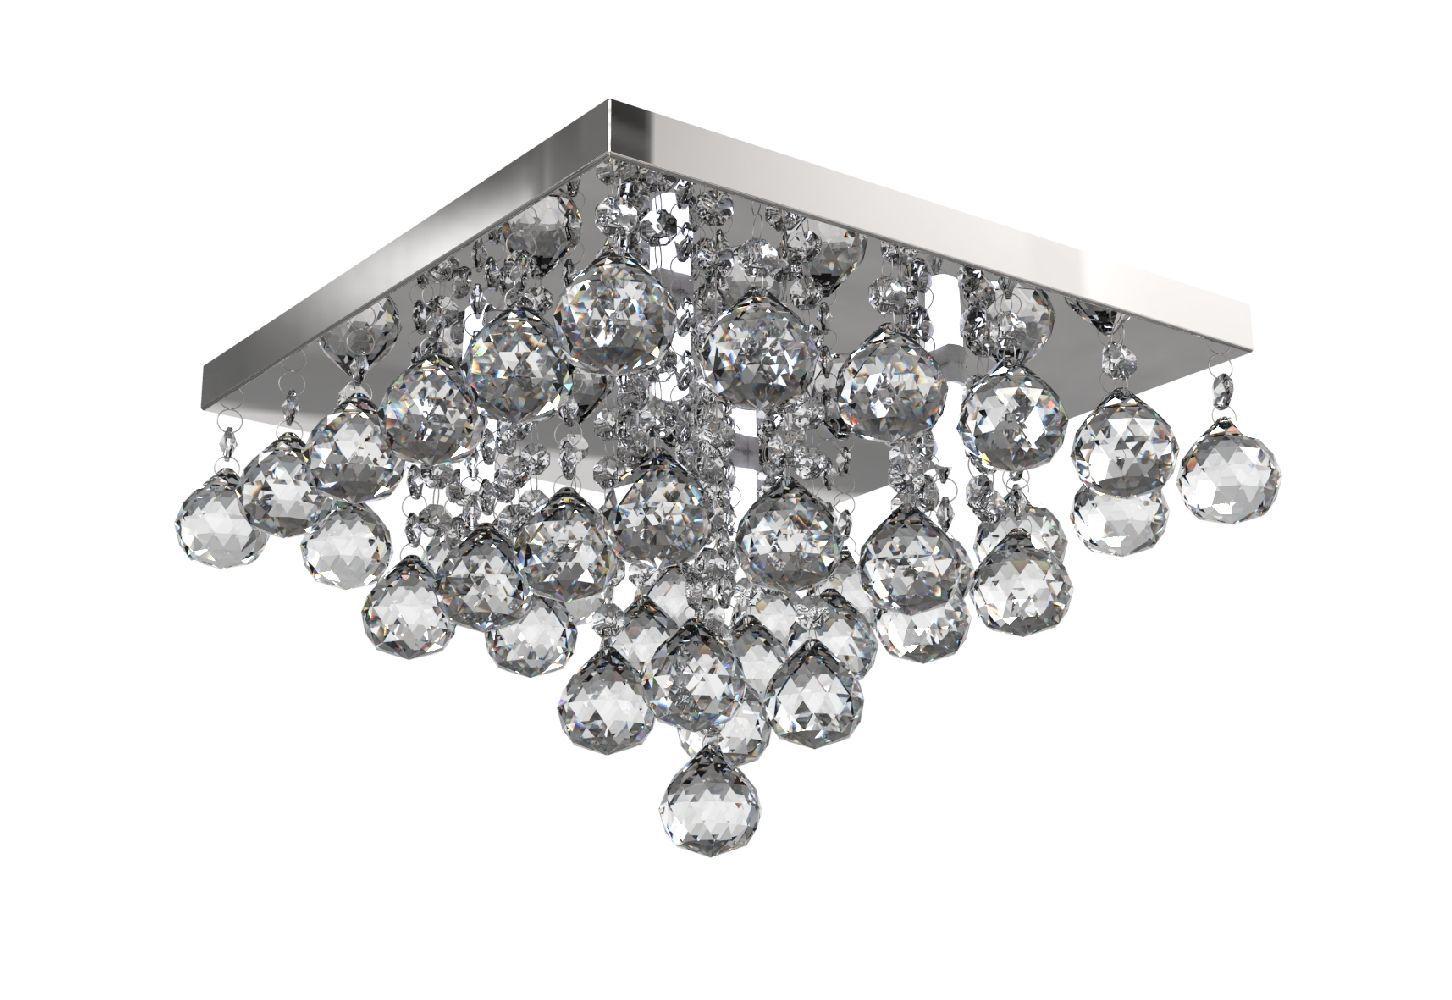 Plafon Lustre de Cristal Legitimo 32cm Quarto Sala Estar Living Hall Entrada Loft C/ Lâmpadas Led